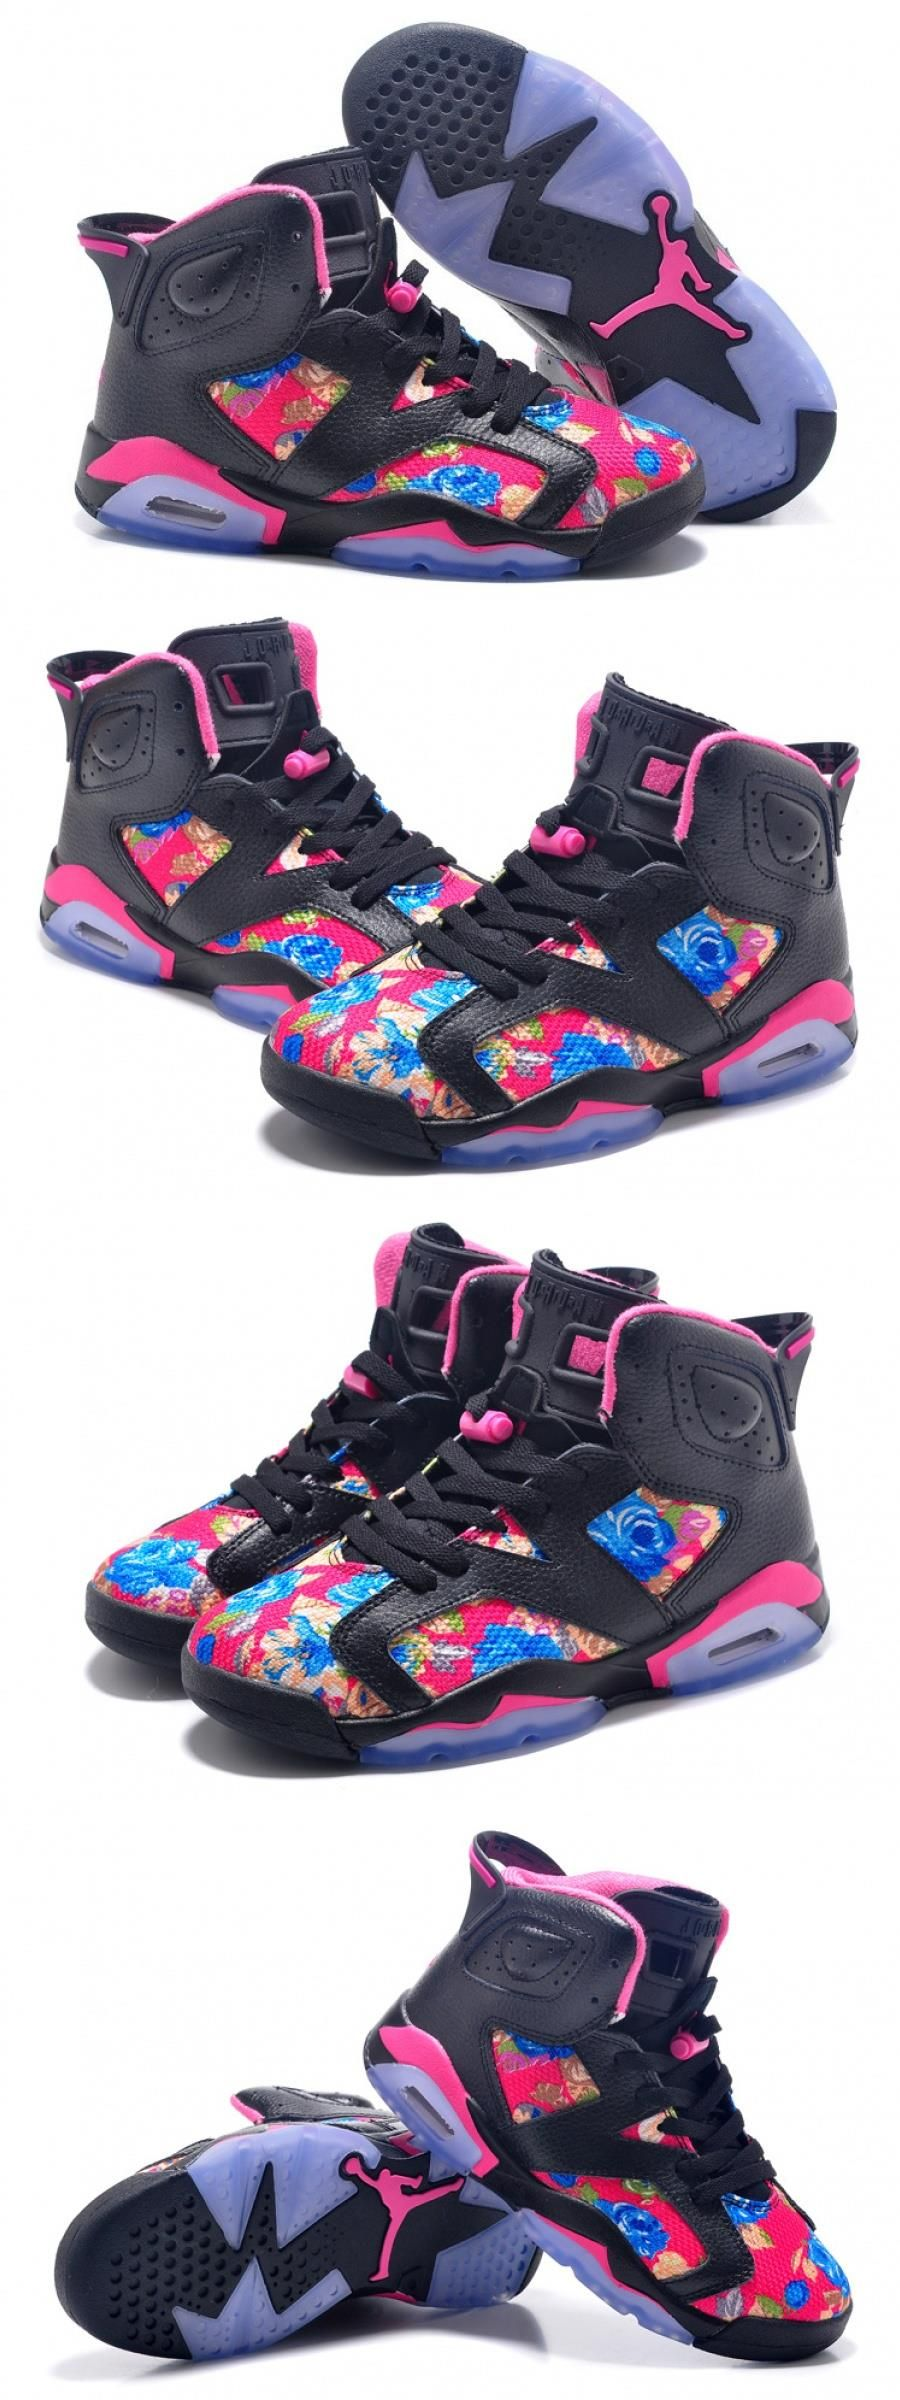 "Air Jordan 6 Gs ""floral Print"" Black Pink Shoes For Pink"